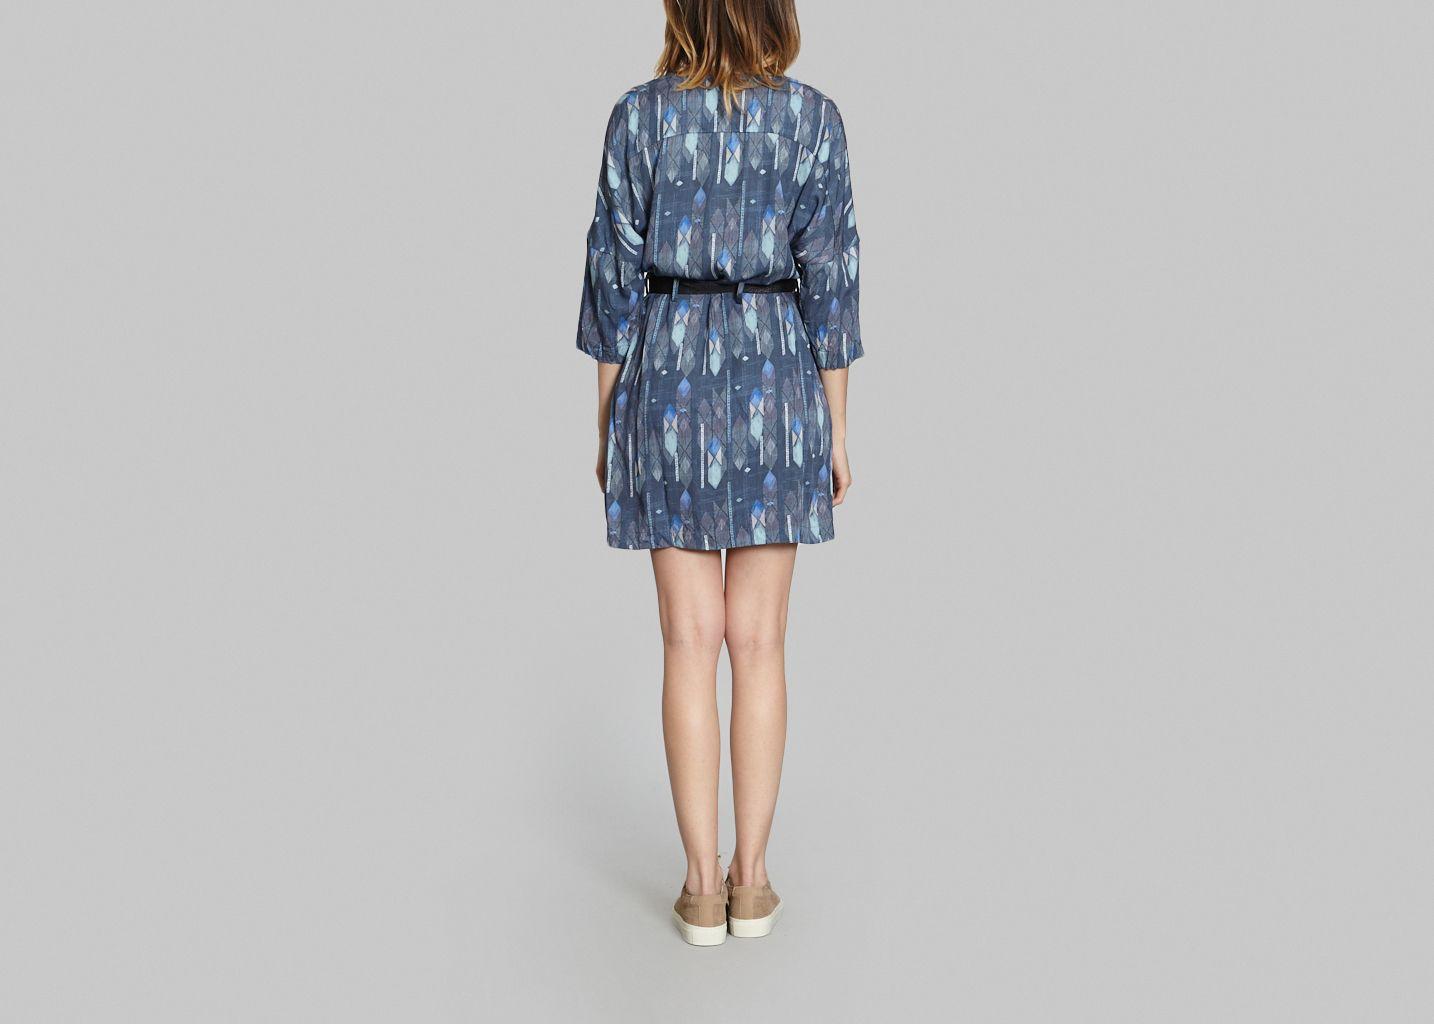 Robe Hazel Frisco - Tinsels